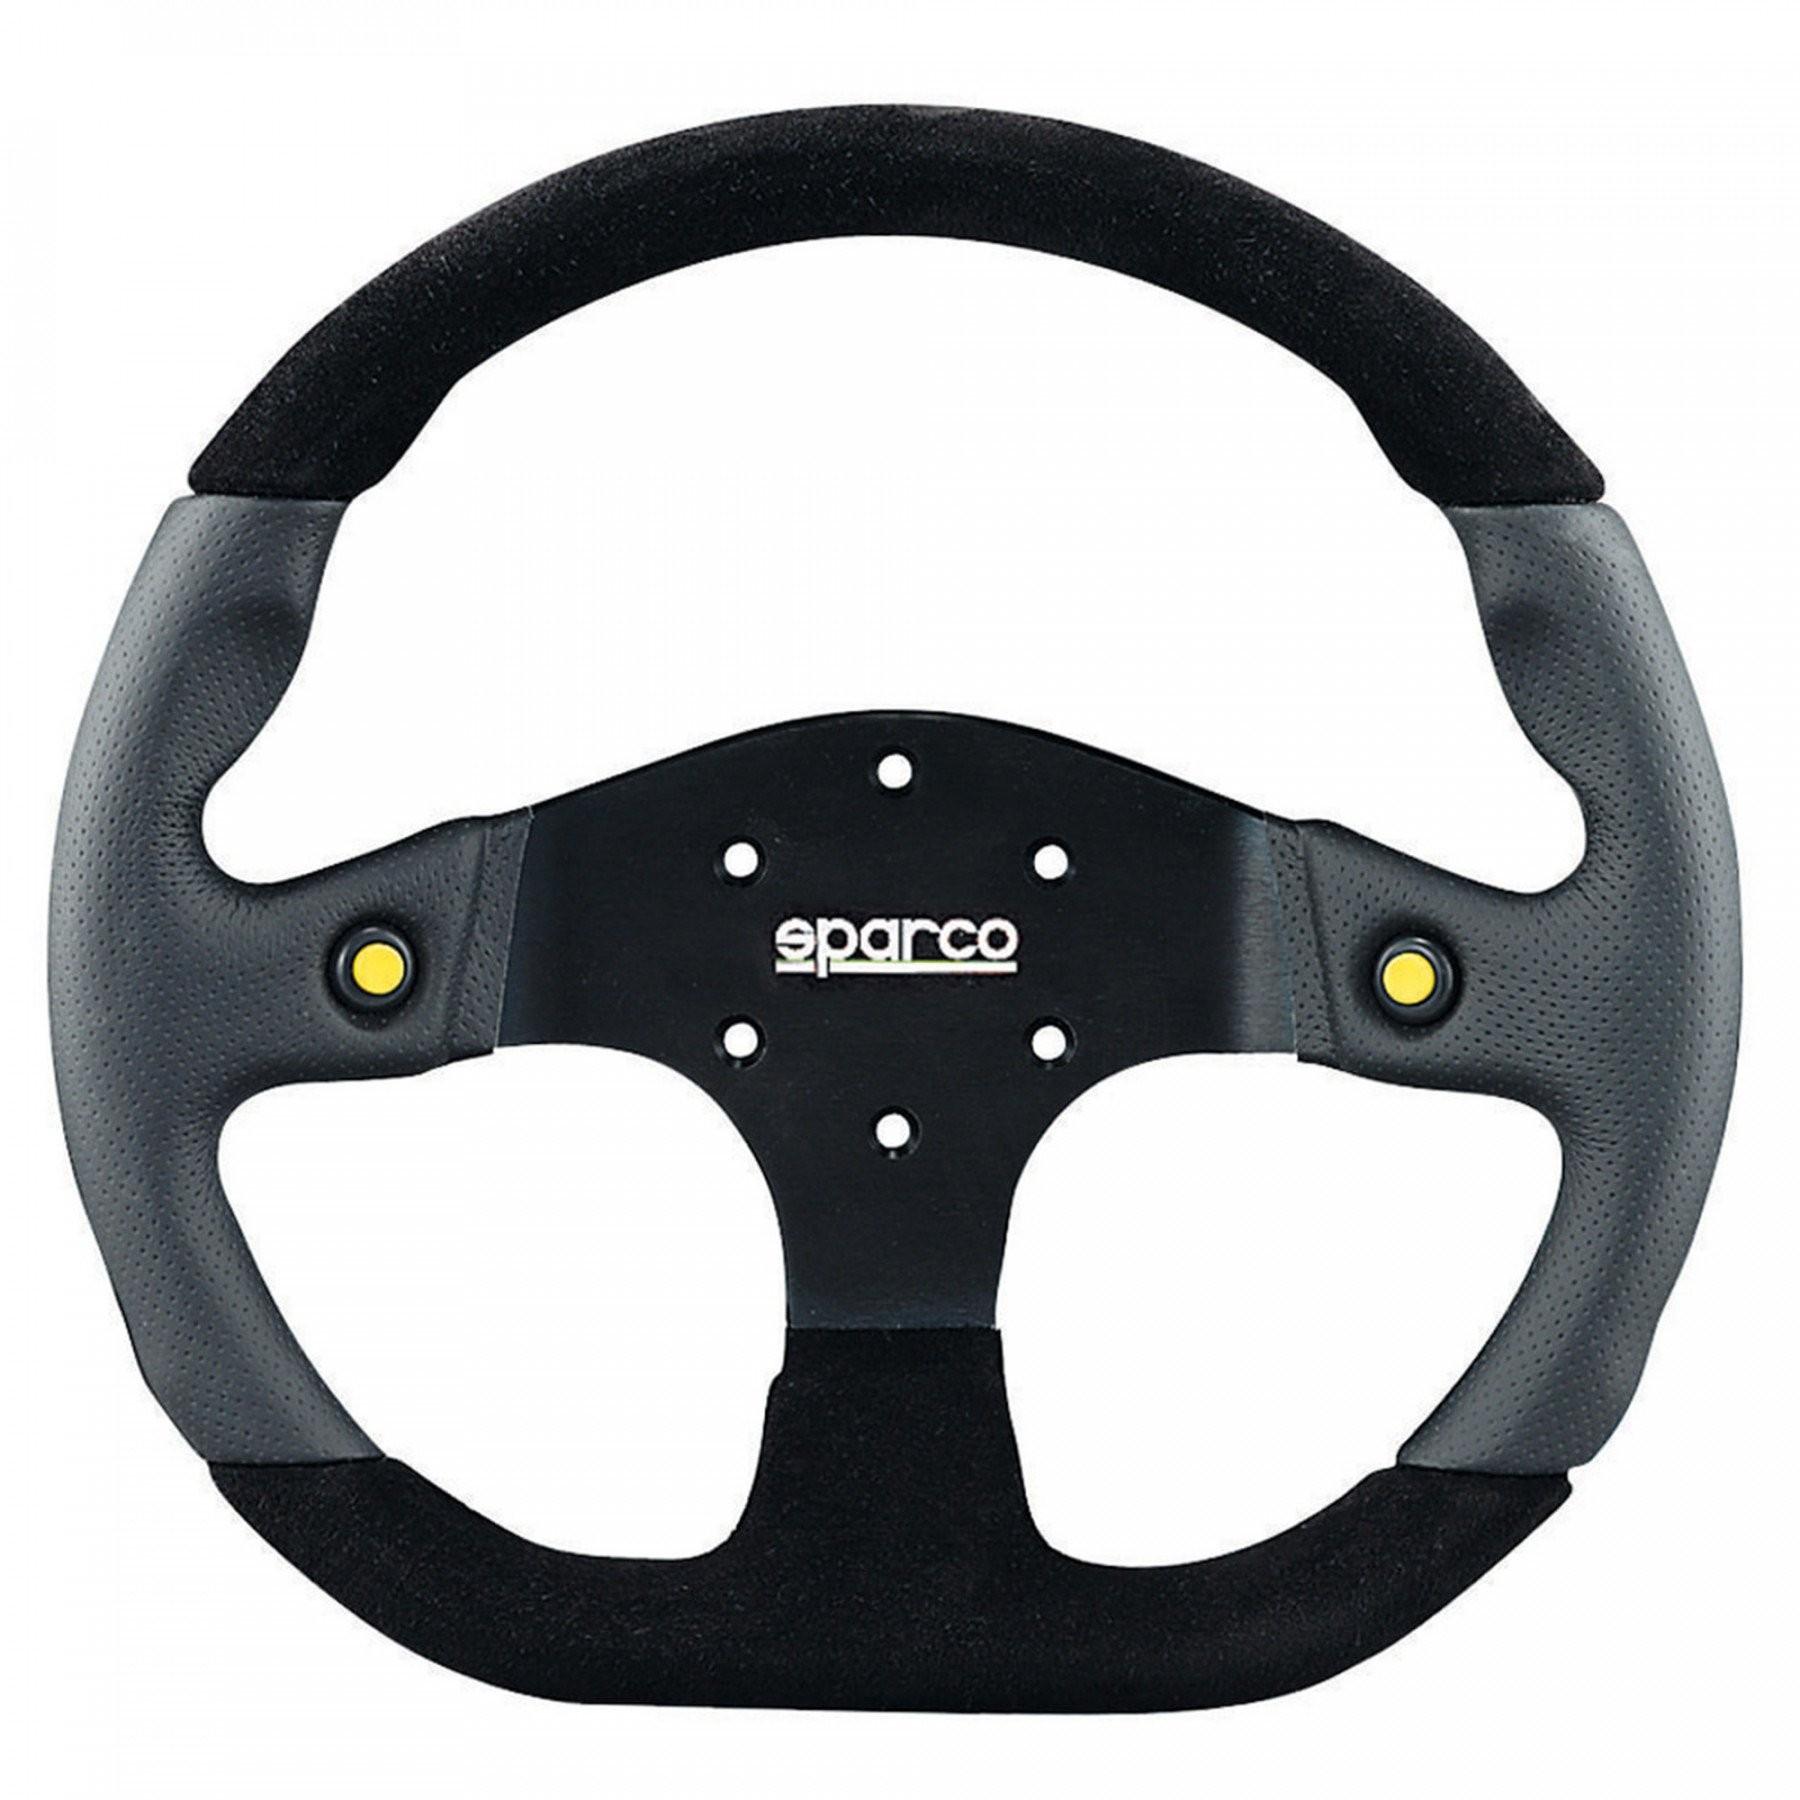 Нов продукт: Sparco L999, Tuning Steering Wheel